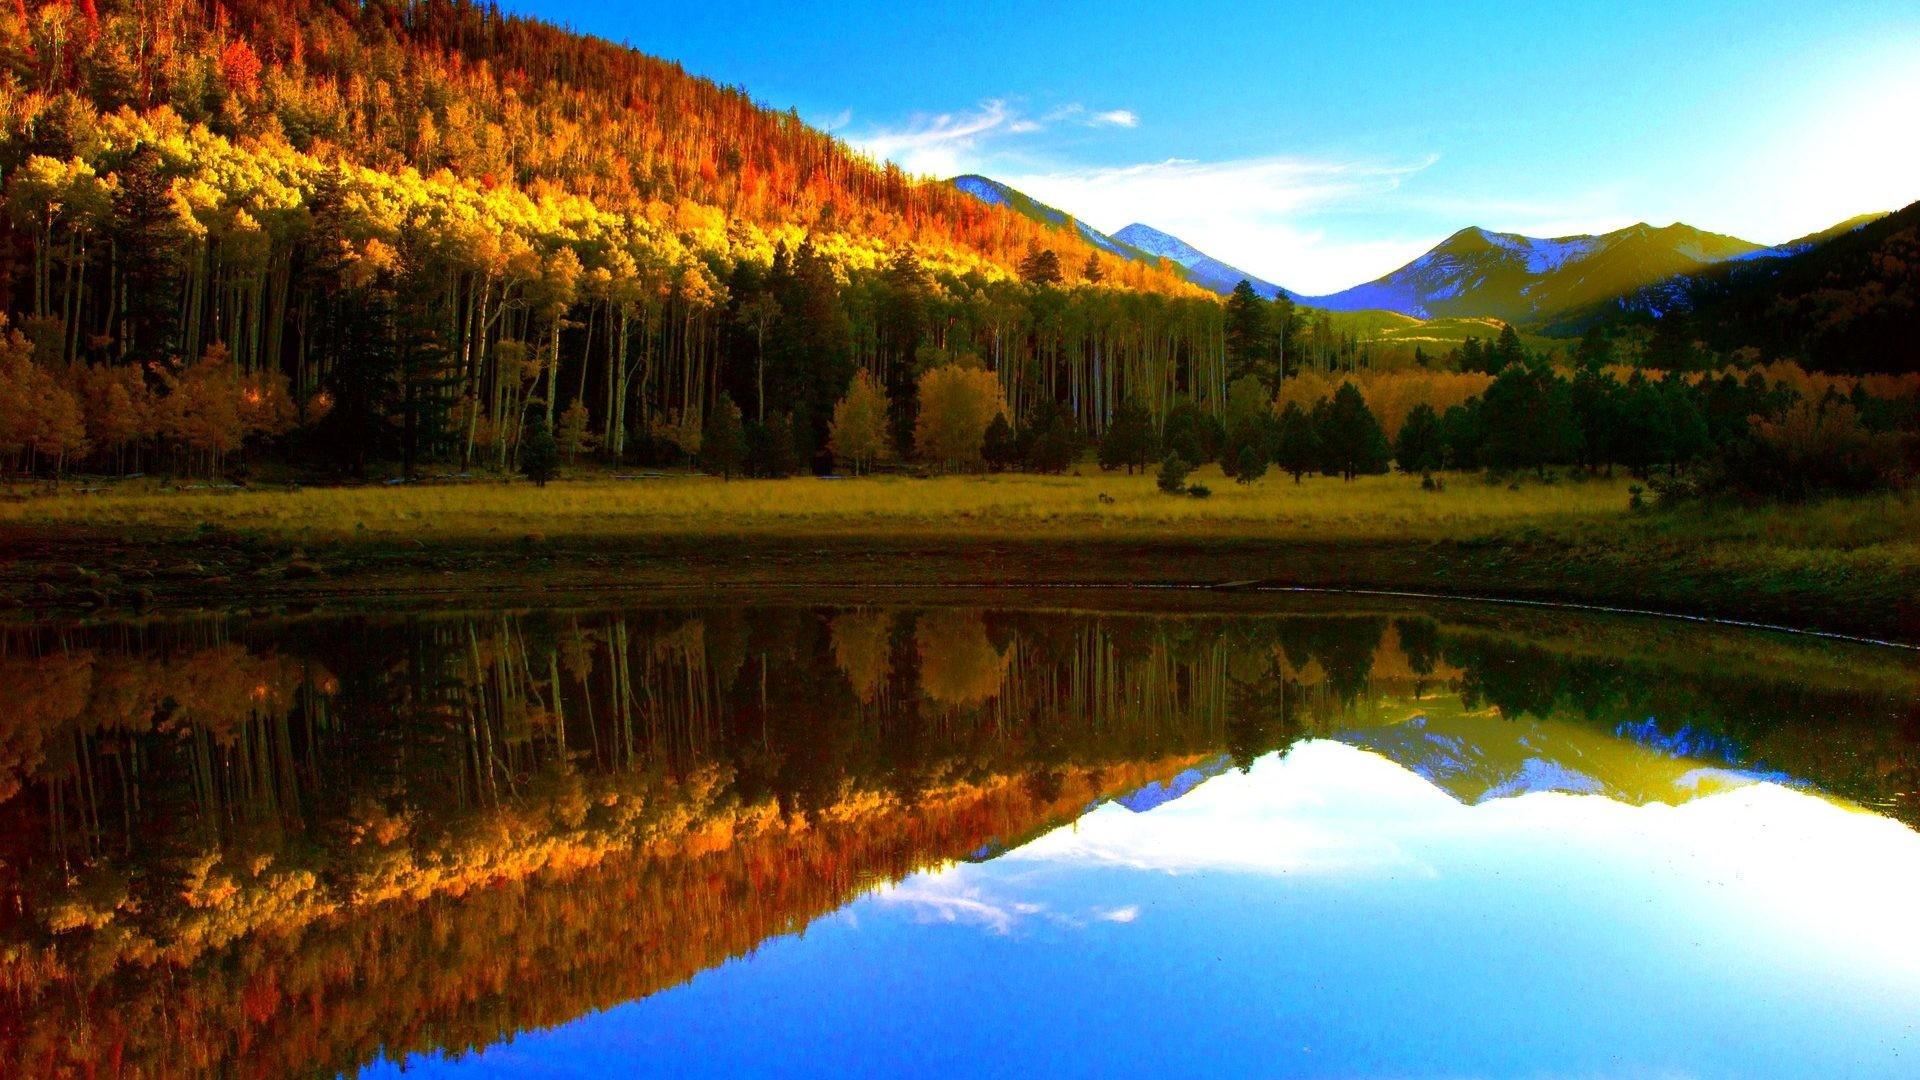 #55BBEE Color – Light Autumn Reflection Fall Mountain Lake Tahoe Desktop  Wallpaper for HD 16